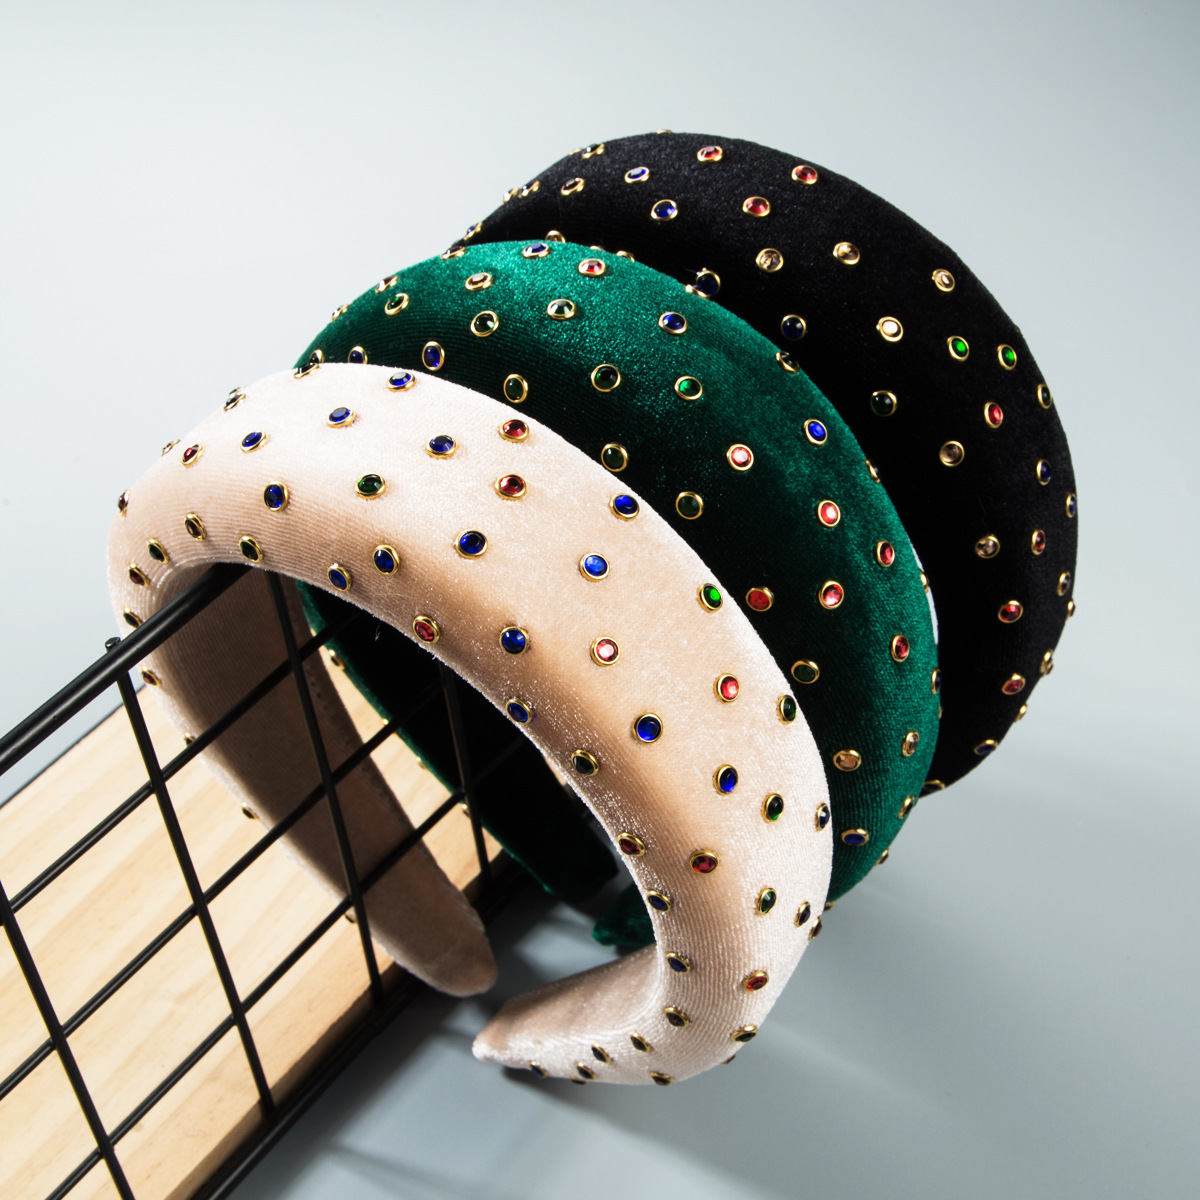 Thicken Padded Hairbands Bezel Turban Women Fashion Western Style New Solid Colors Headbands Girls Accessories Headwear